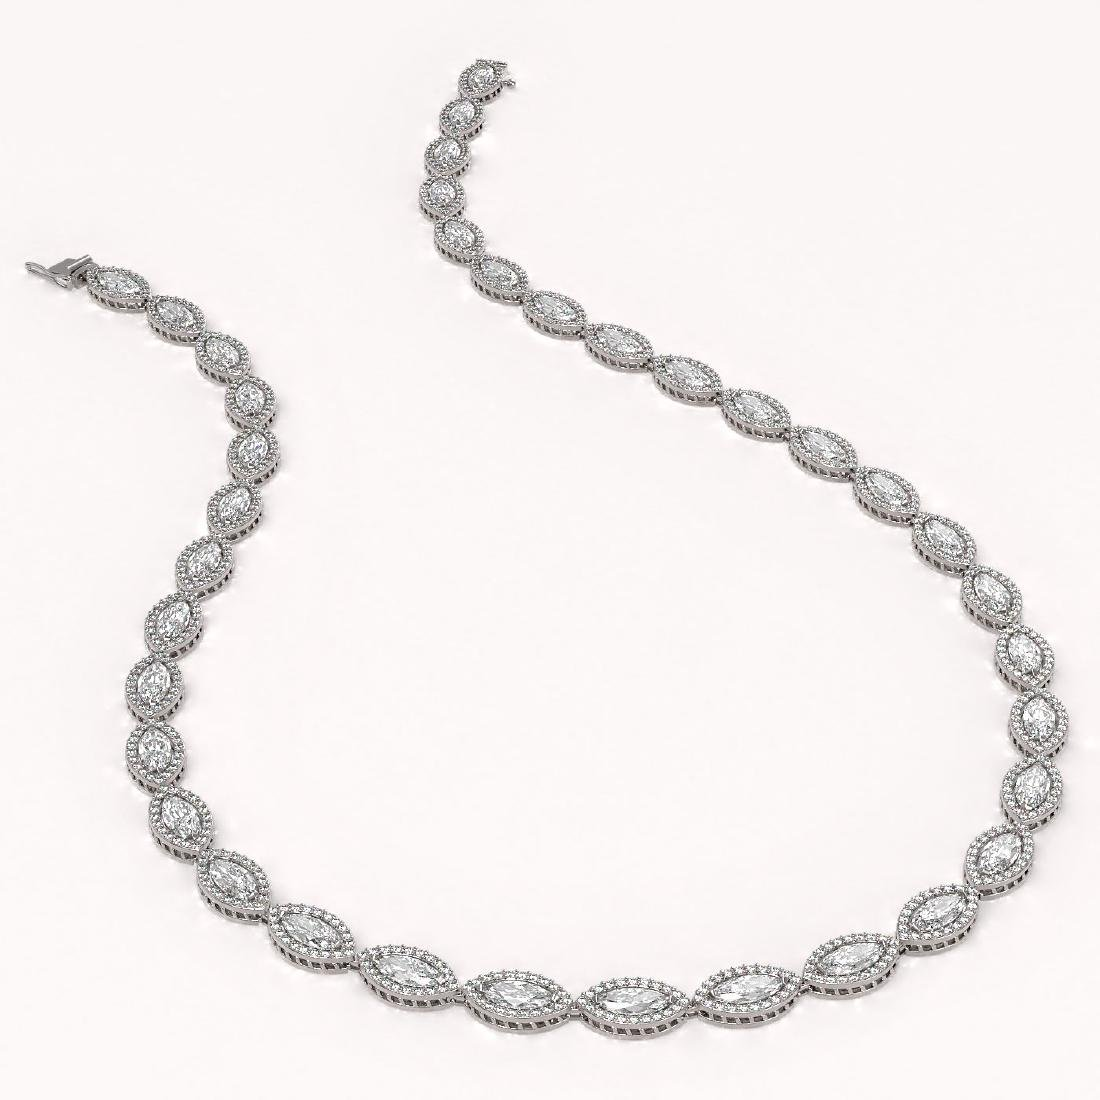 28.12 CTW Marquise Diamond Designer Necklace 18K White - 2